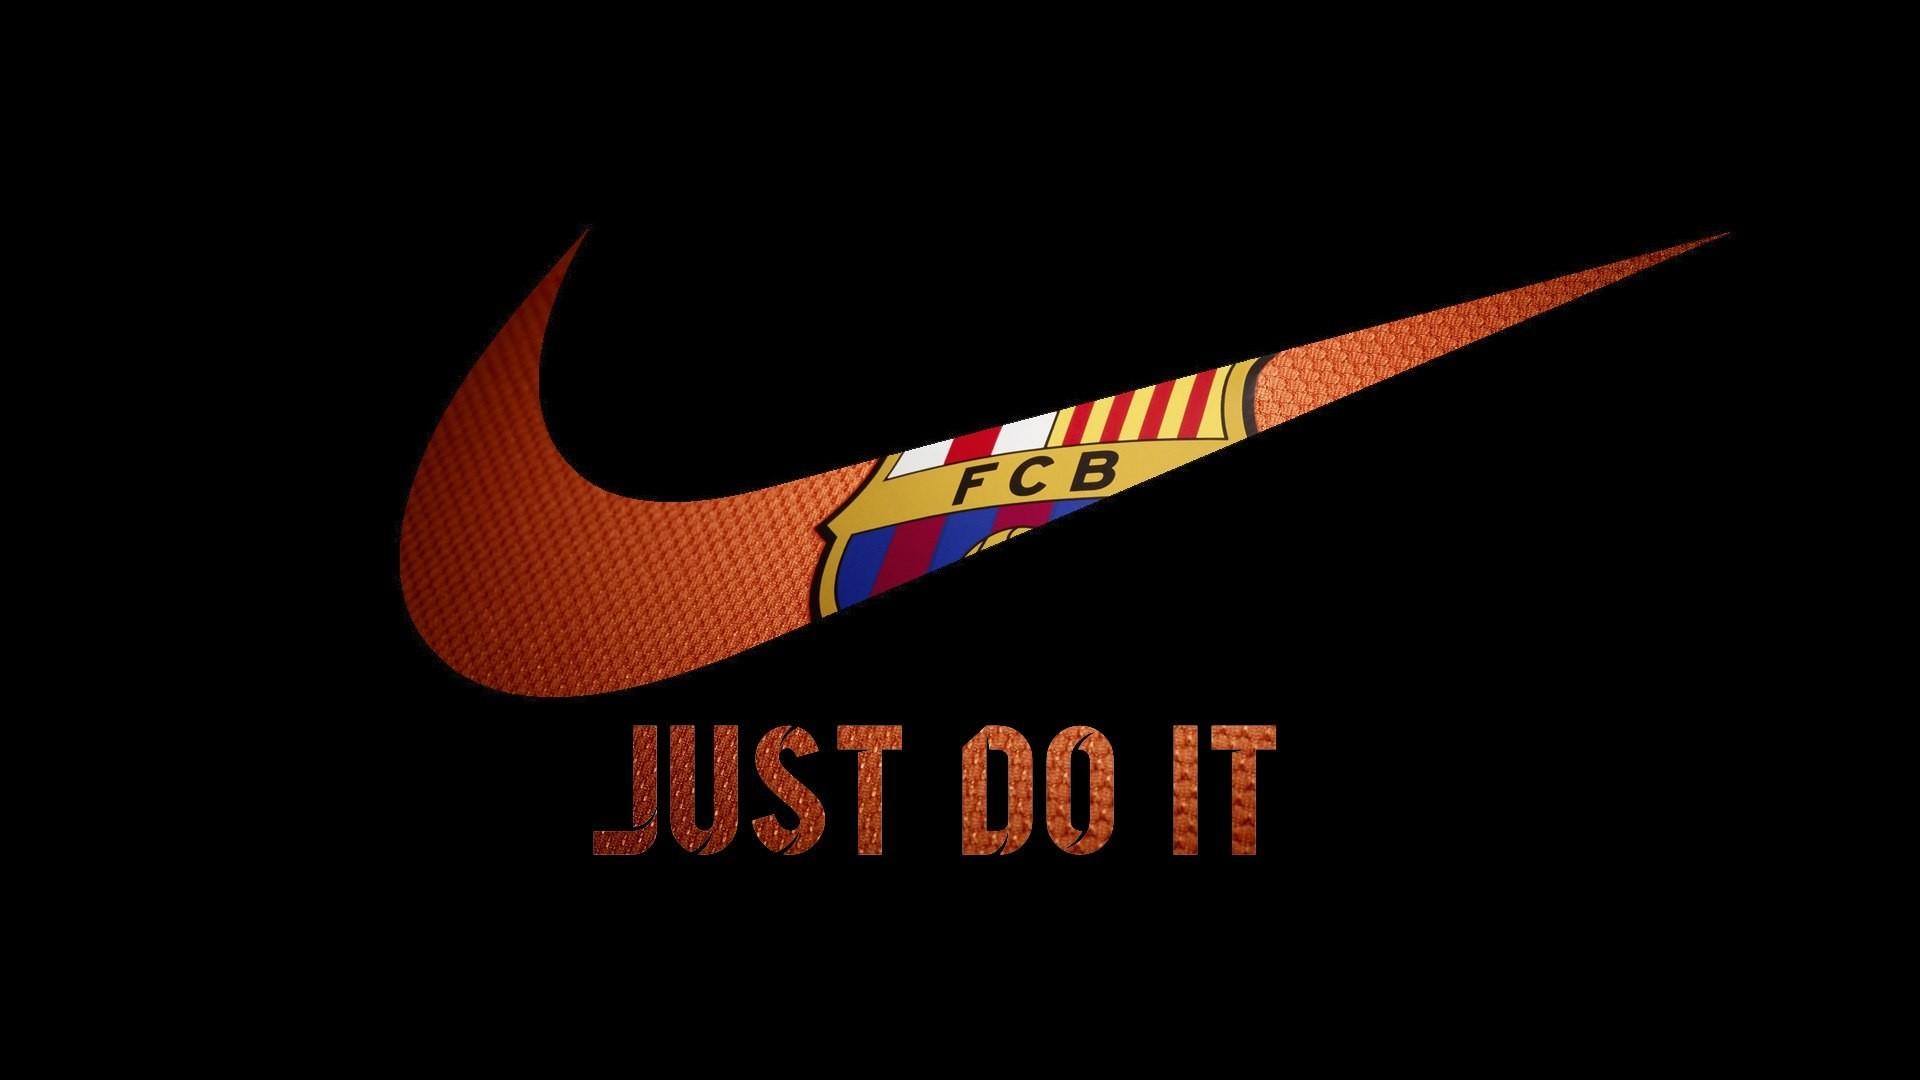 Fc Barcelona Nike Wallpaper